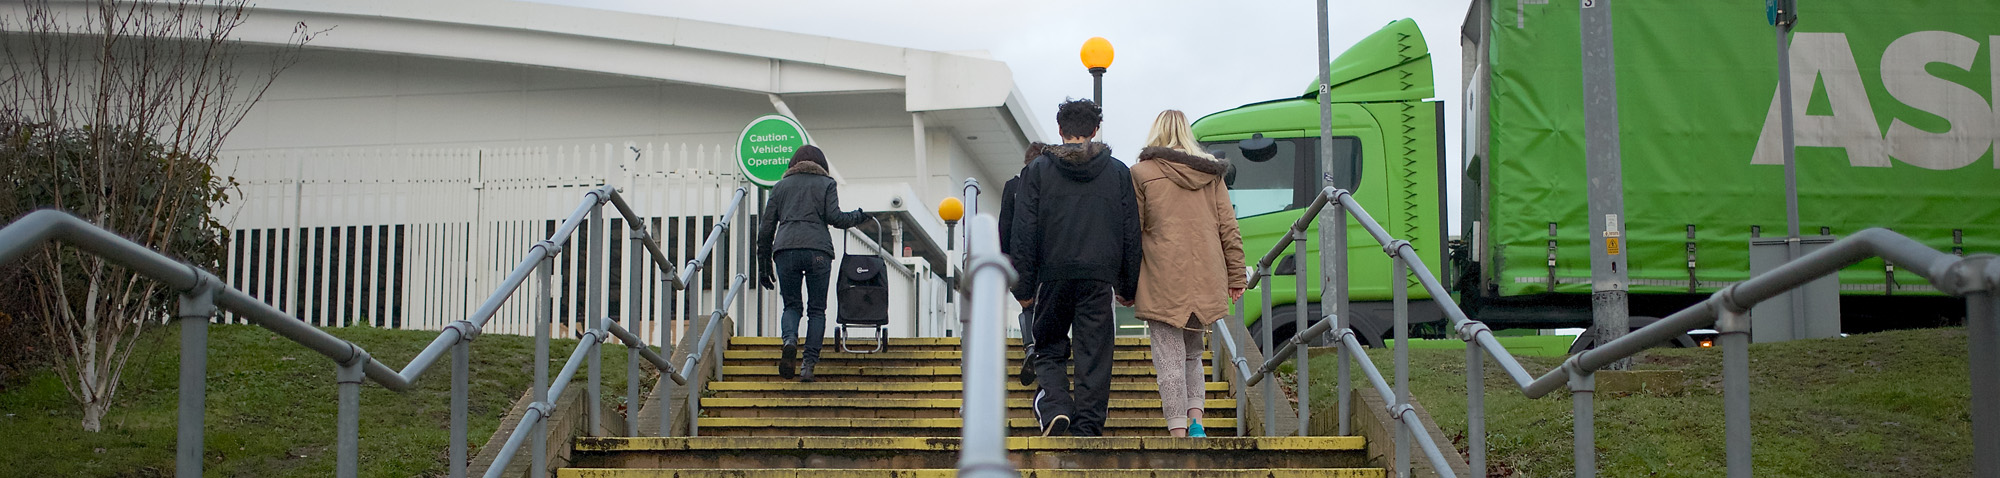 Ultra-wide screen image of people walking up steps